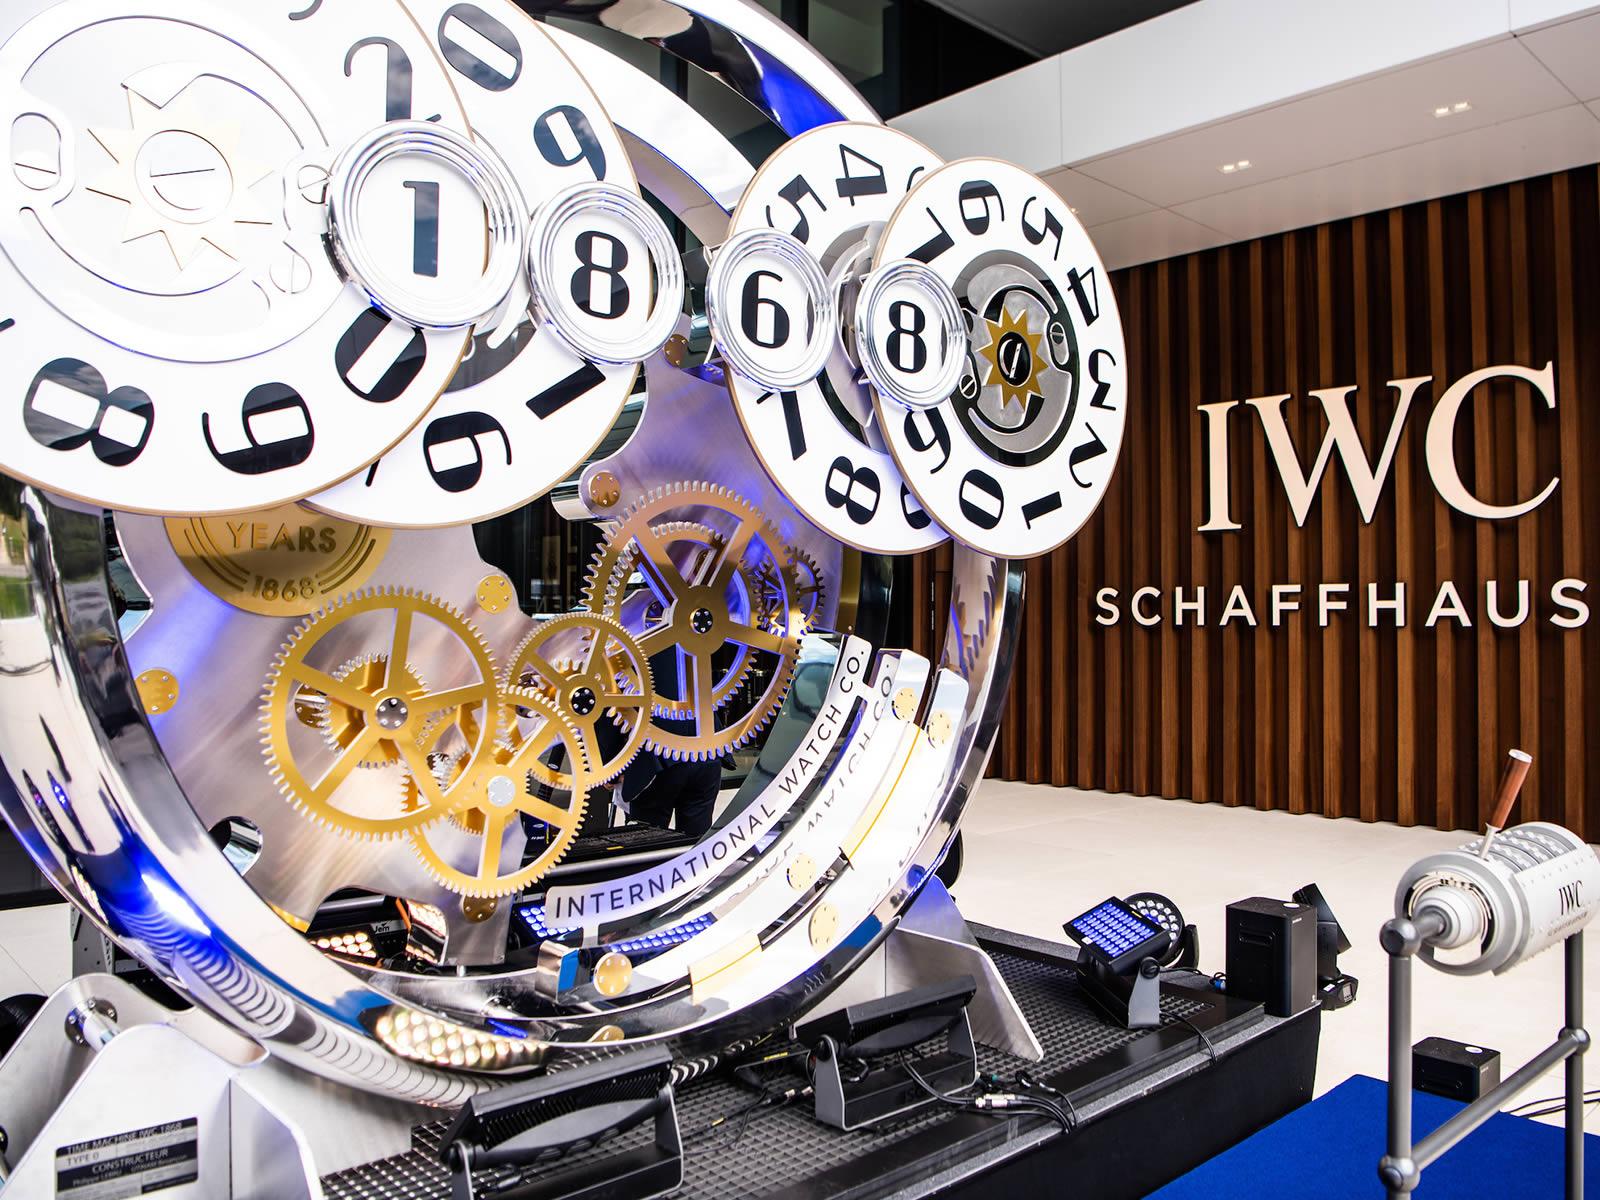 iwc-yeni-fabrika-2-.jpg